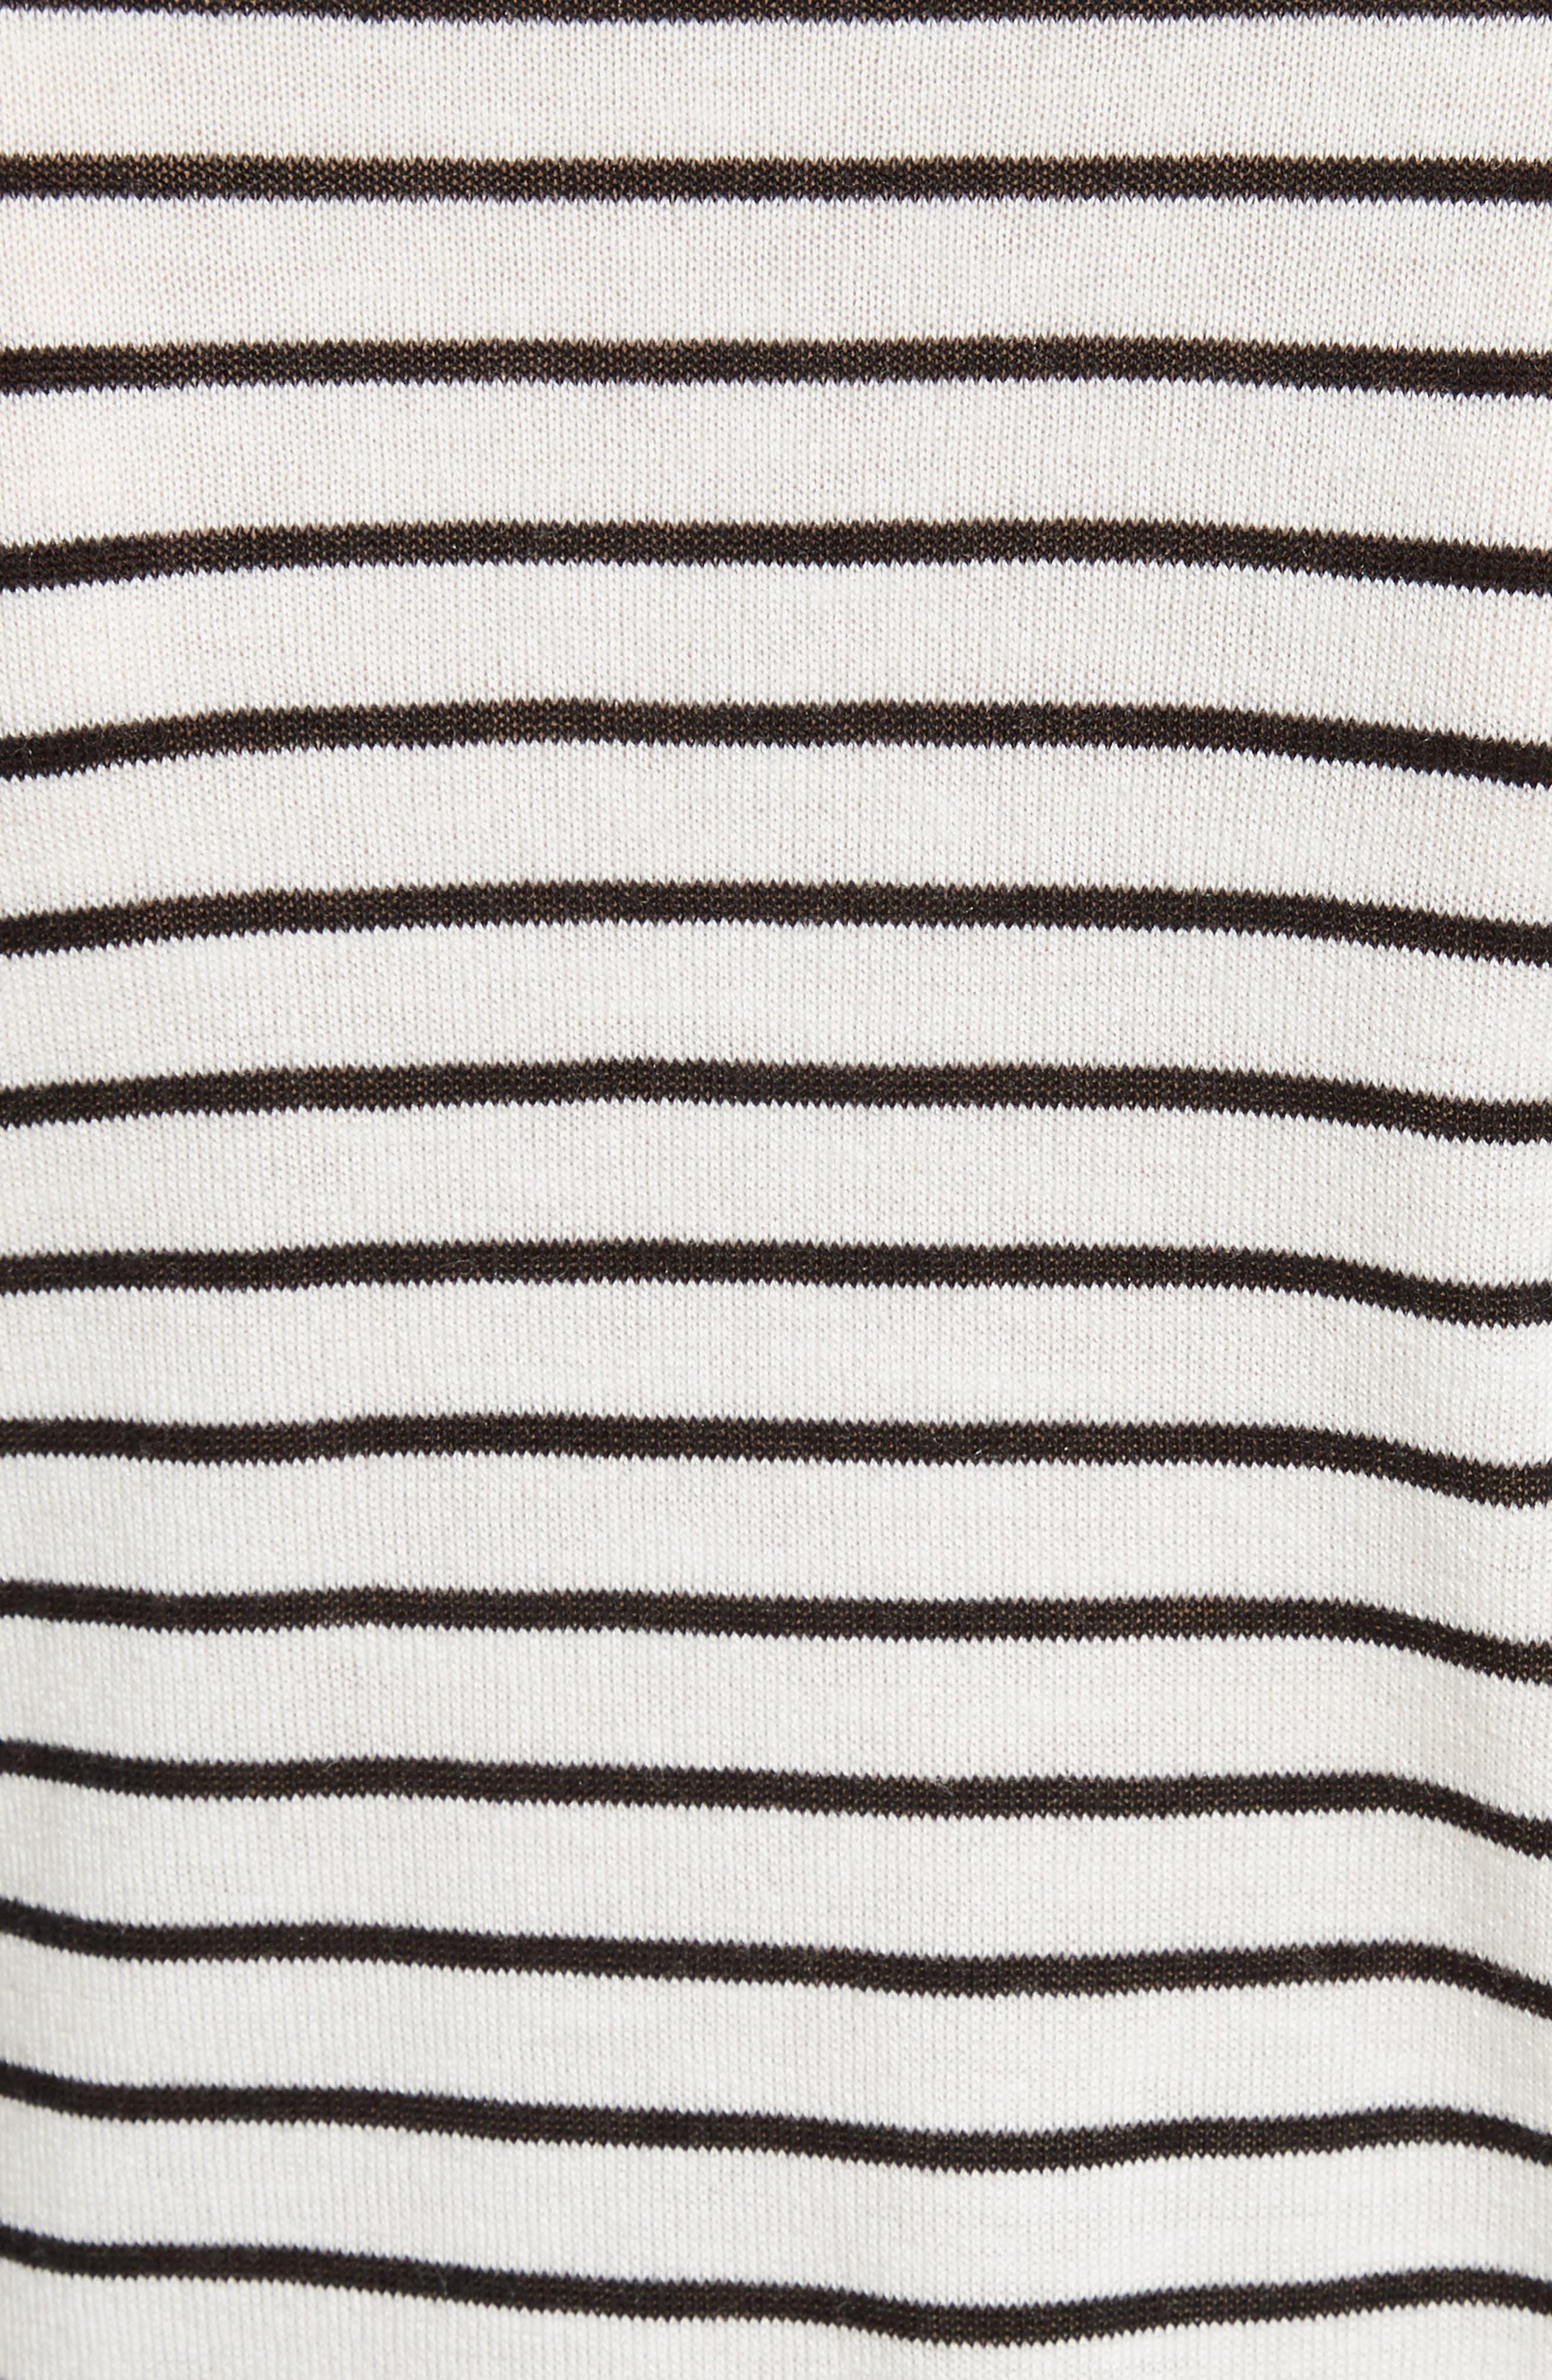 Stripe Silk Blend Sweater,                             Alternate thumbnail 5, color,                             110